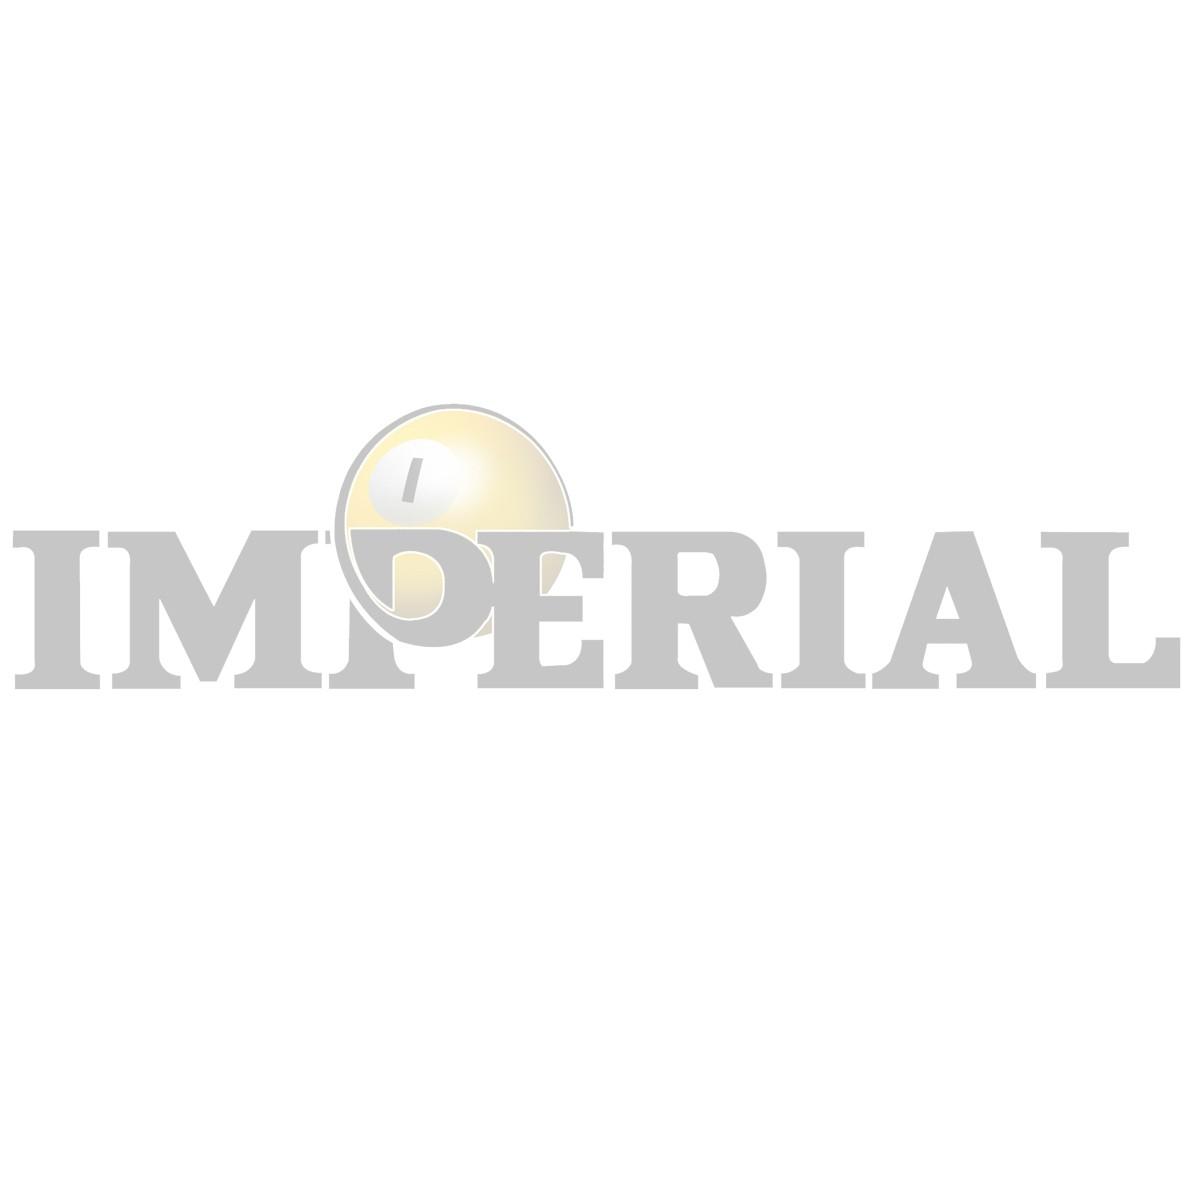 Penn State Home vs. Away Billiard Ball Set